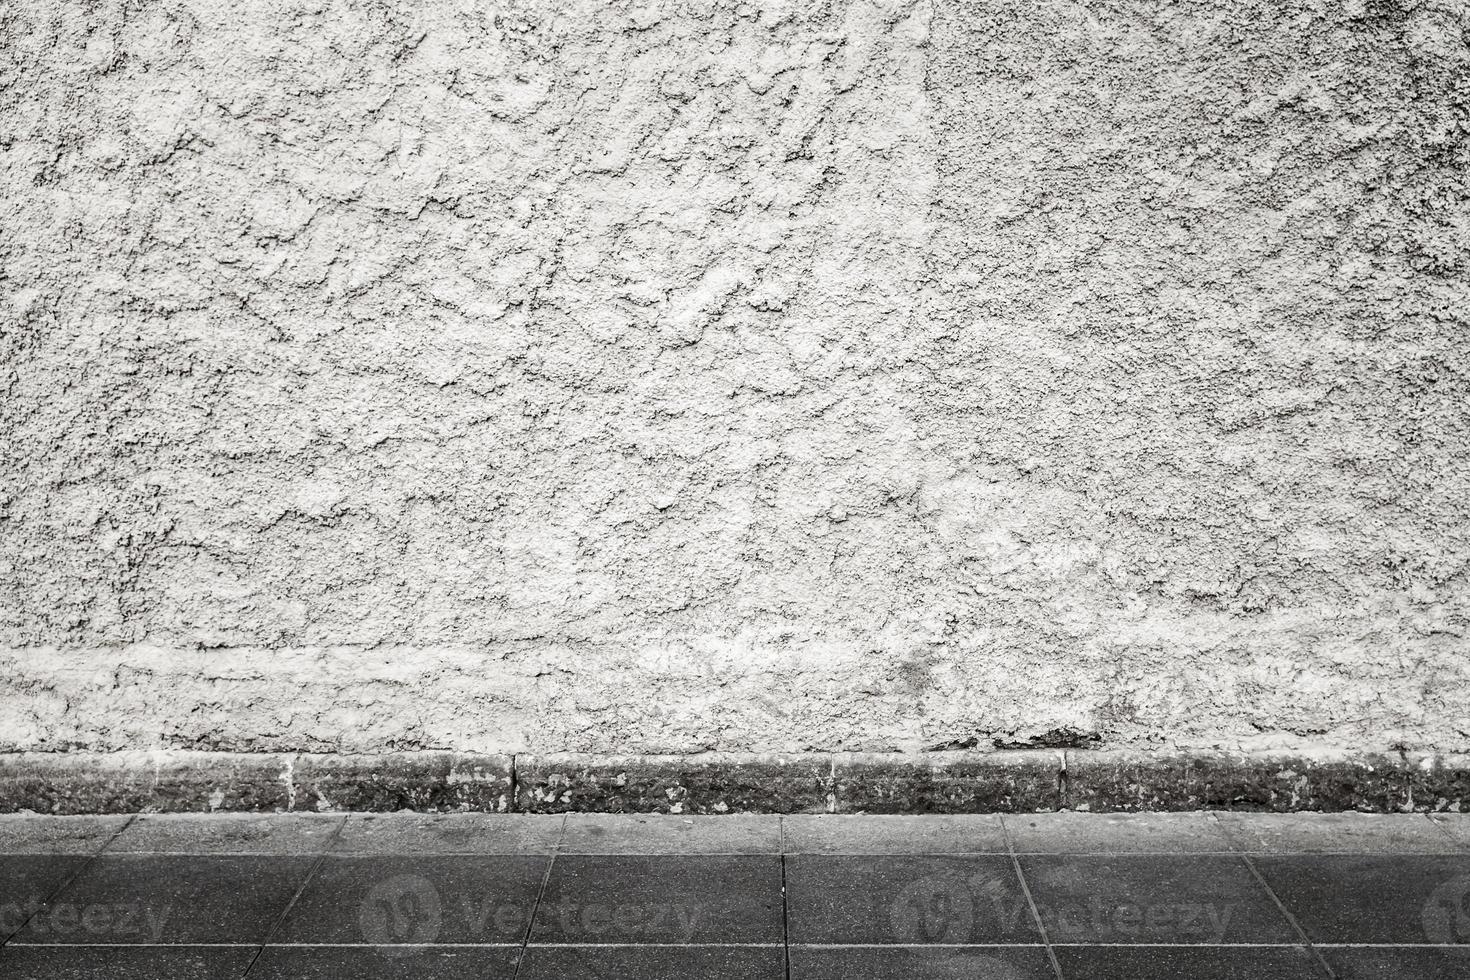 stedelijke achtergrond interieur met witte grungy betonnen wand foto